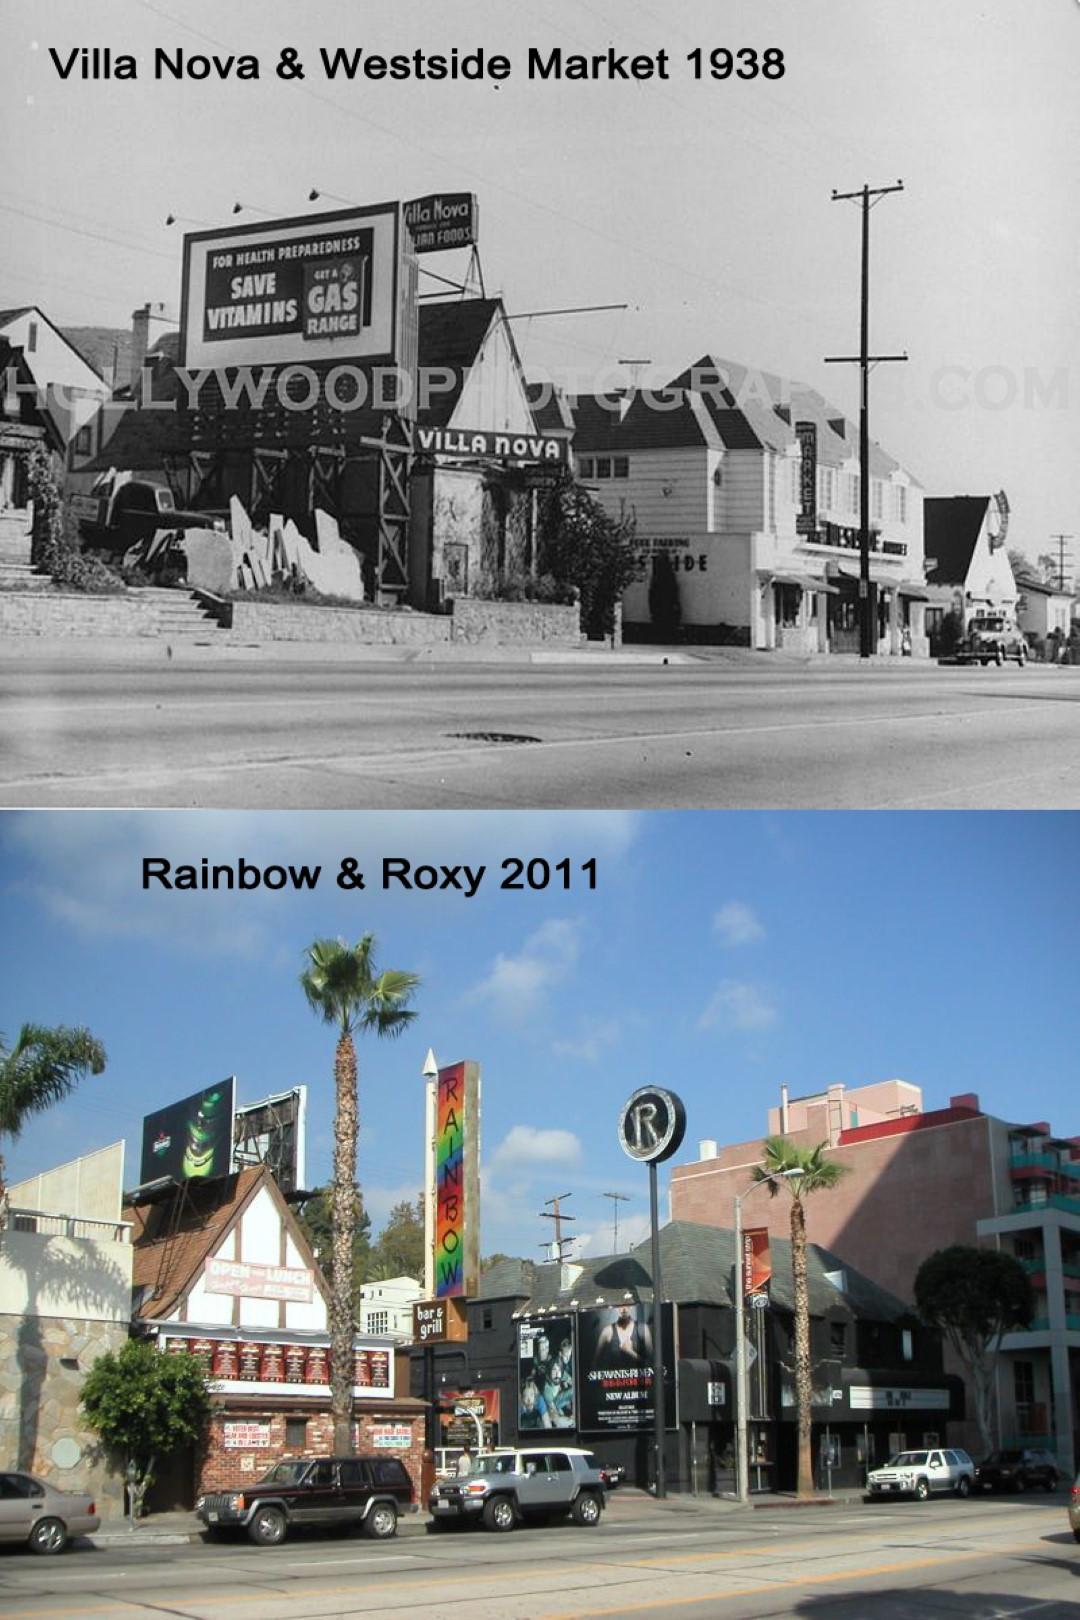 Roxy & Rainbow 1938 - 2011